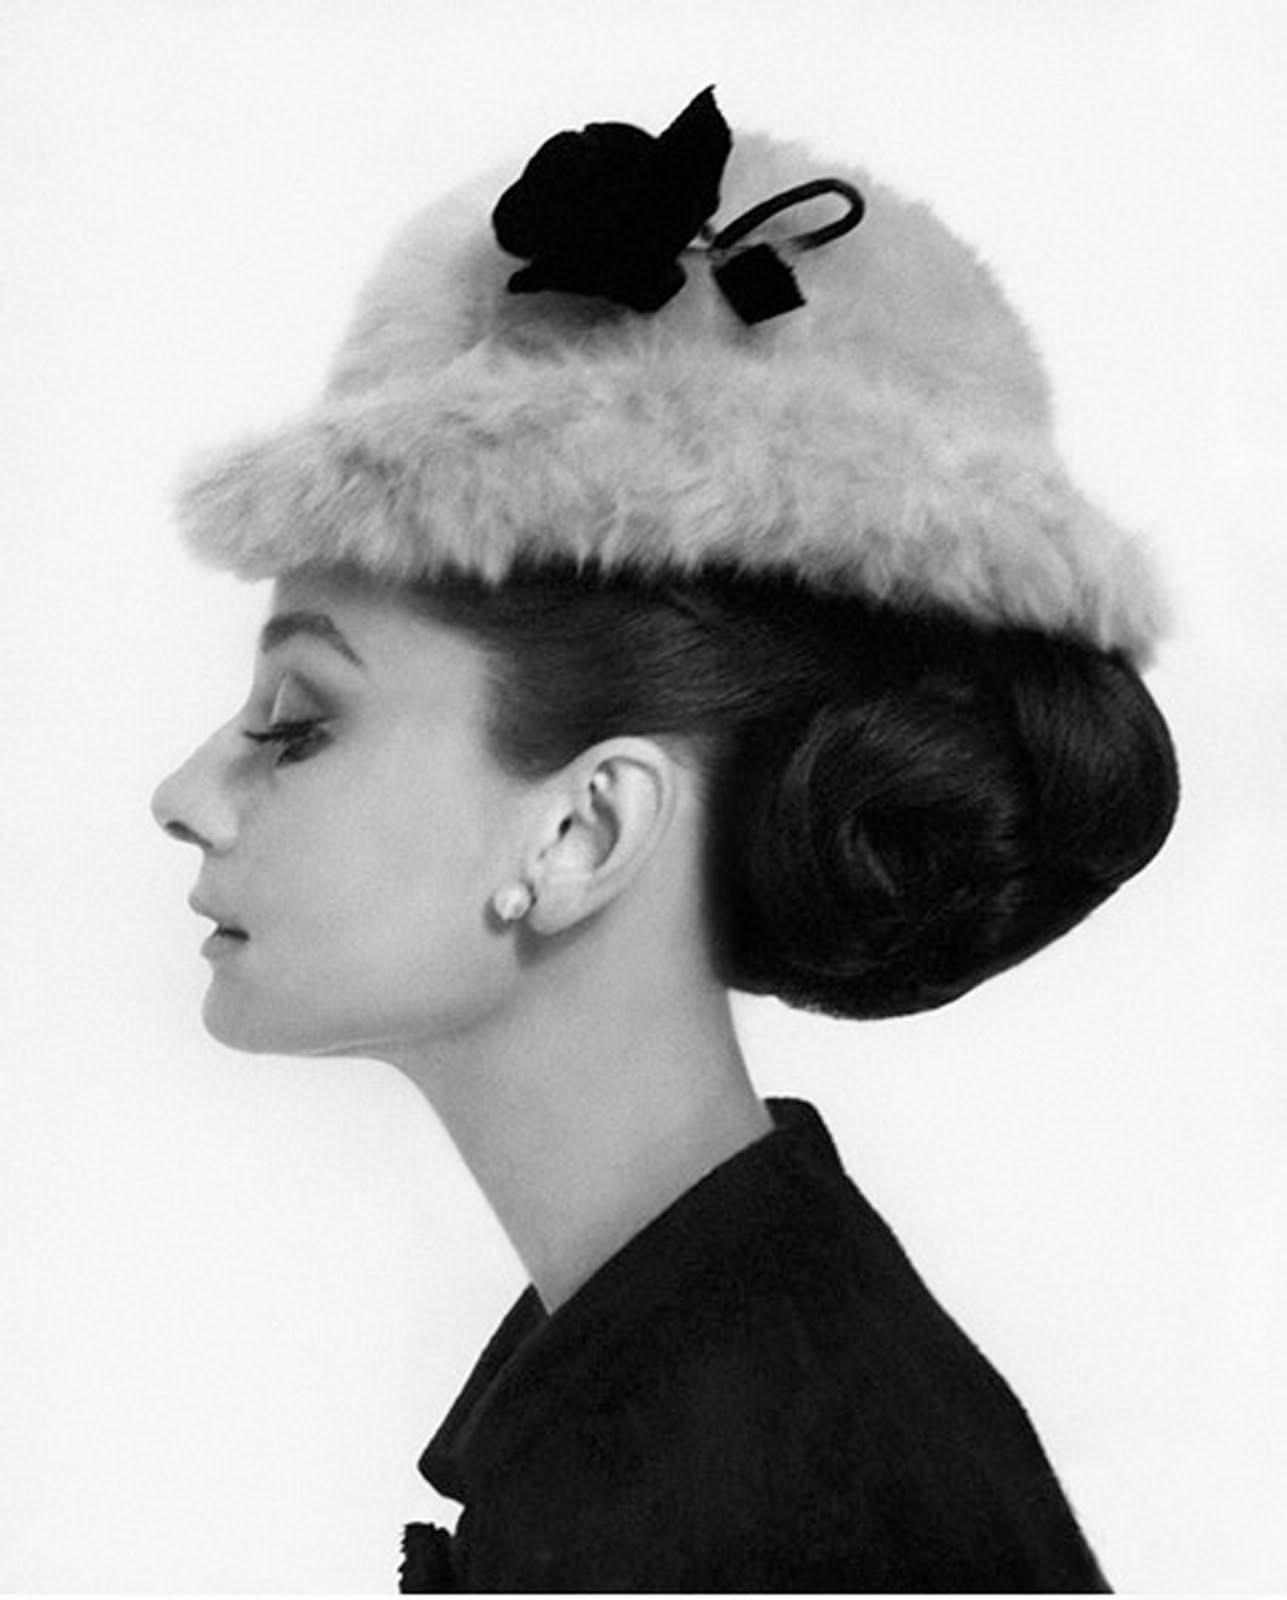 Girly Bedroom Audrey Hepburn Poster: The Style Files: Blair Inspired Room: Gossip Girl Decor